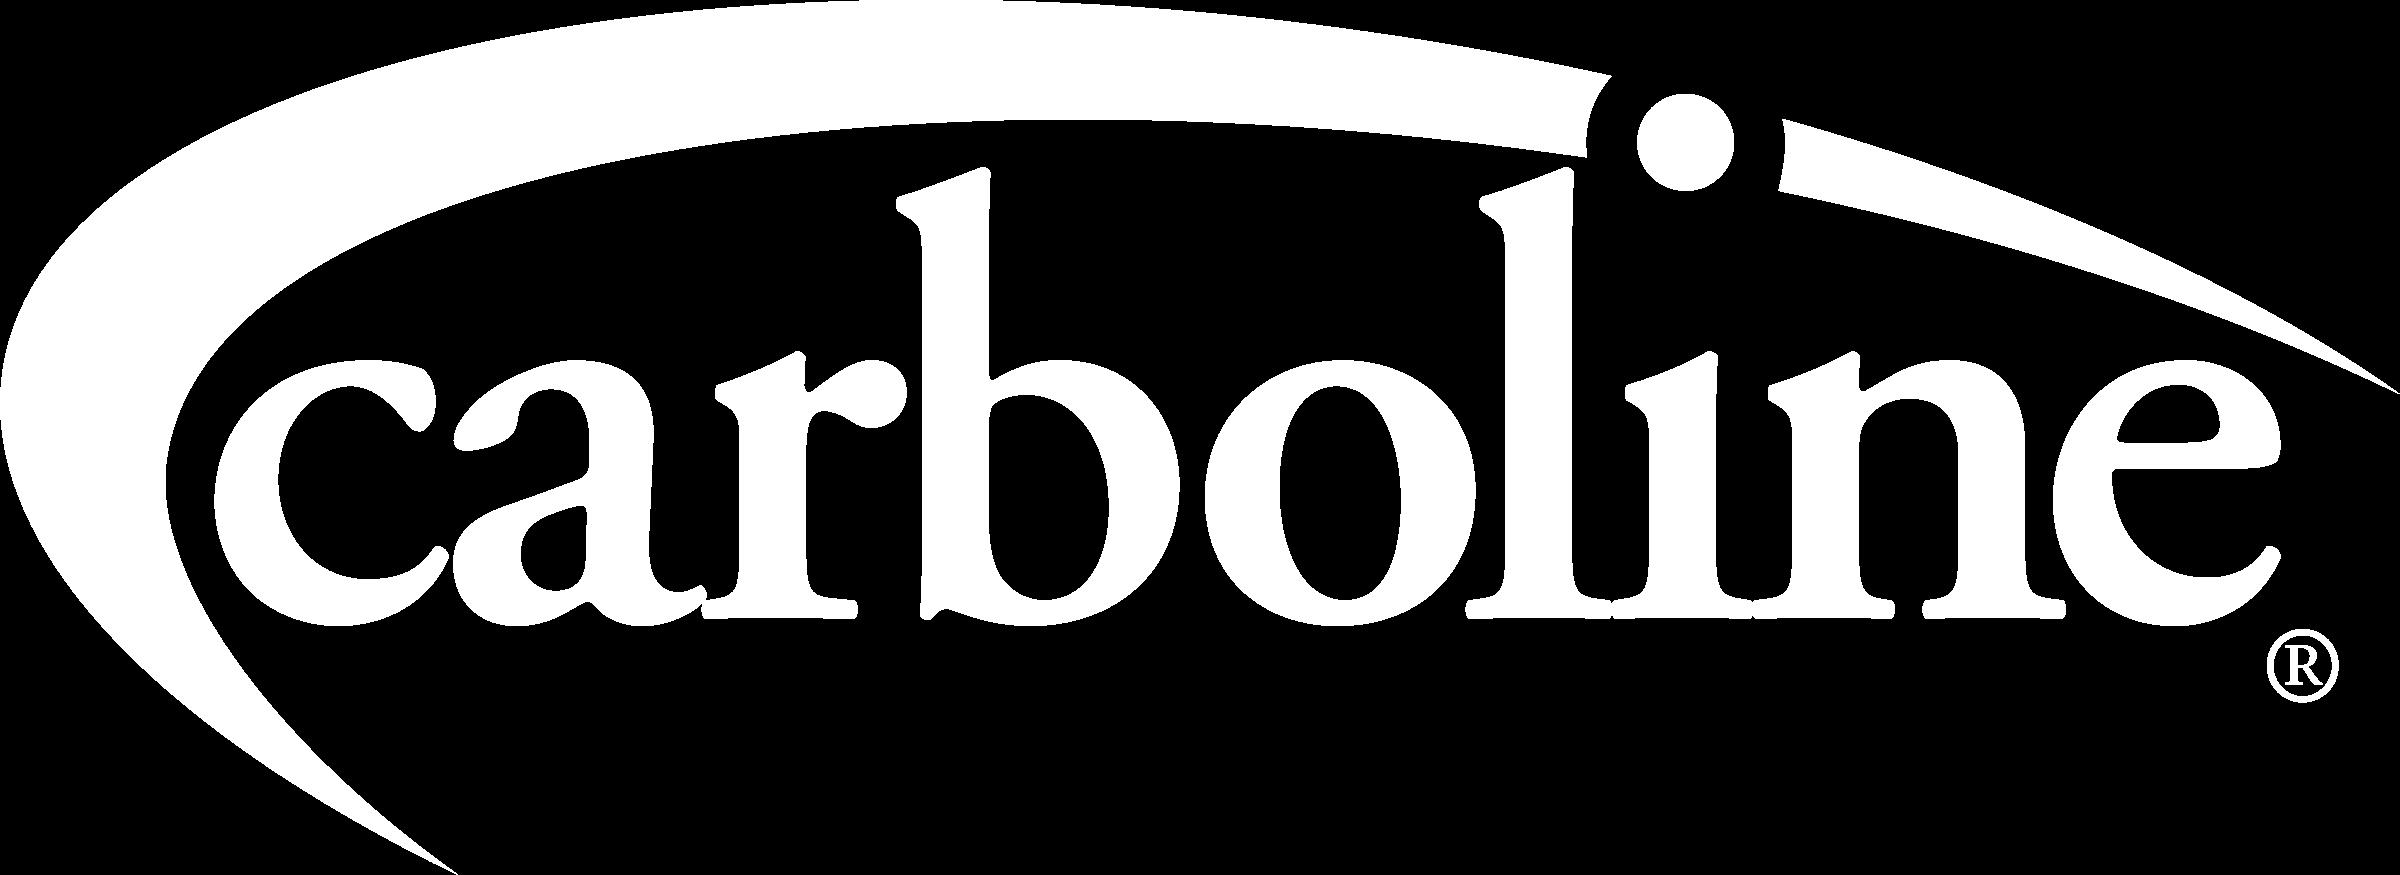 carboline-logo-black-and-white